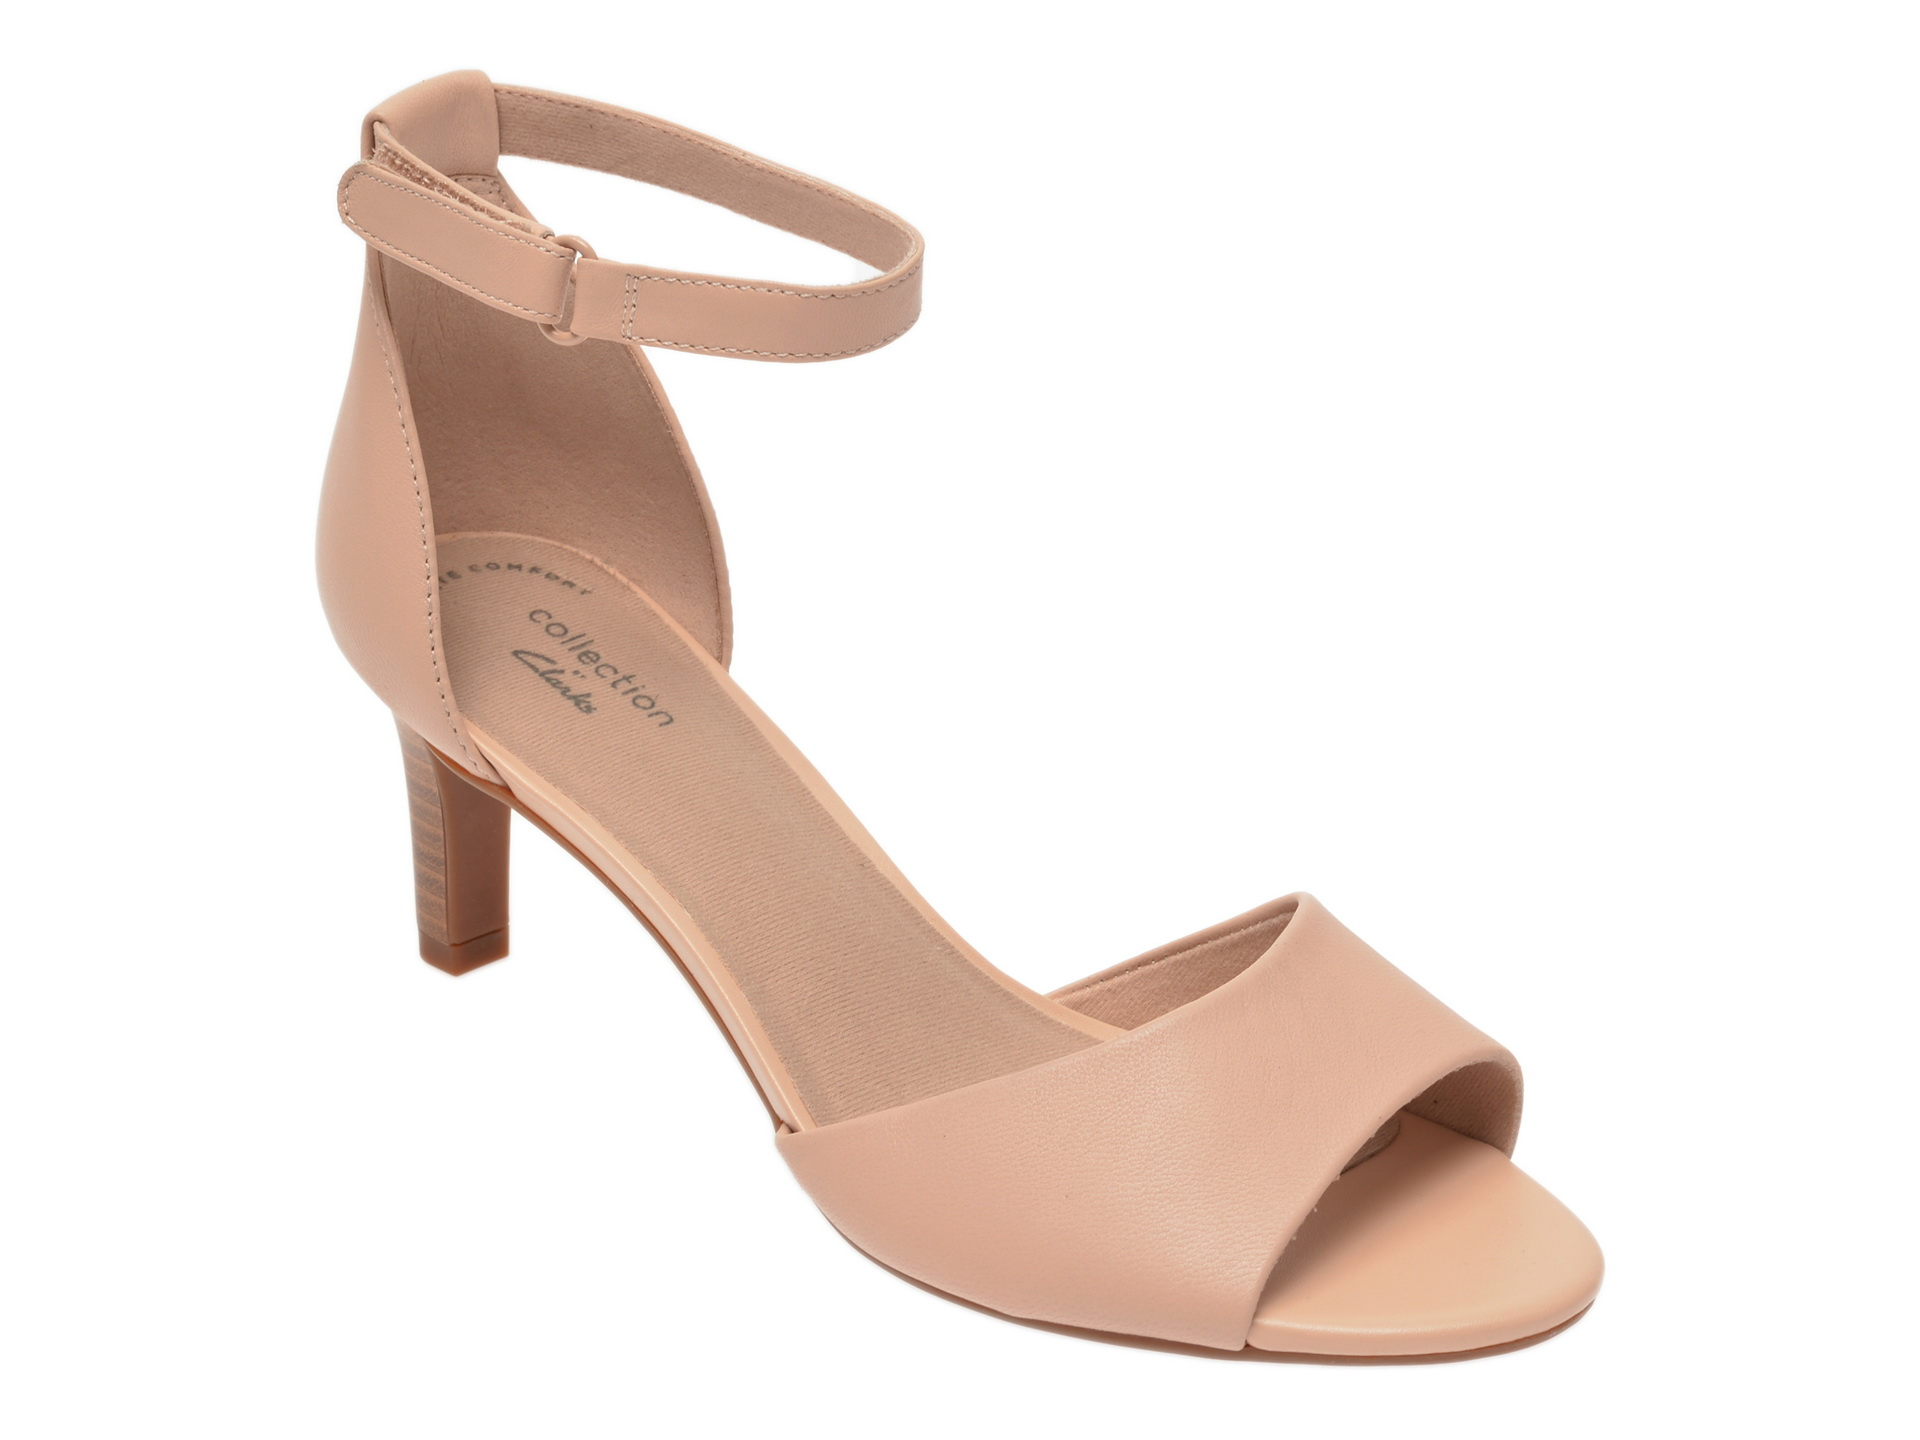 Sandale CLARKS nude, Alice Greta, din piele naturala New